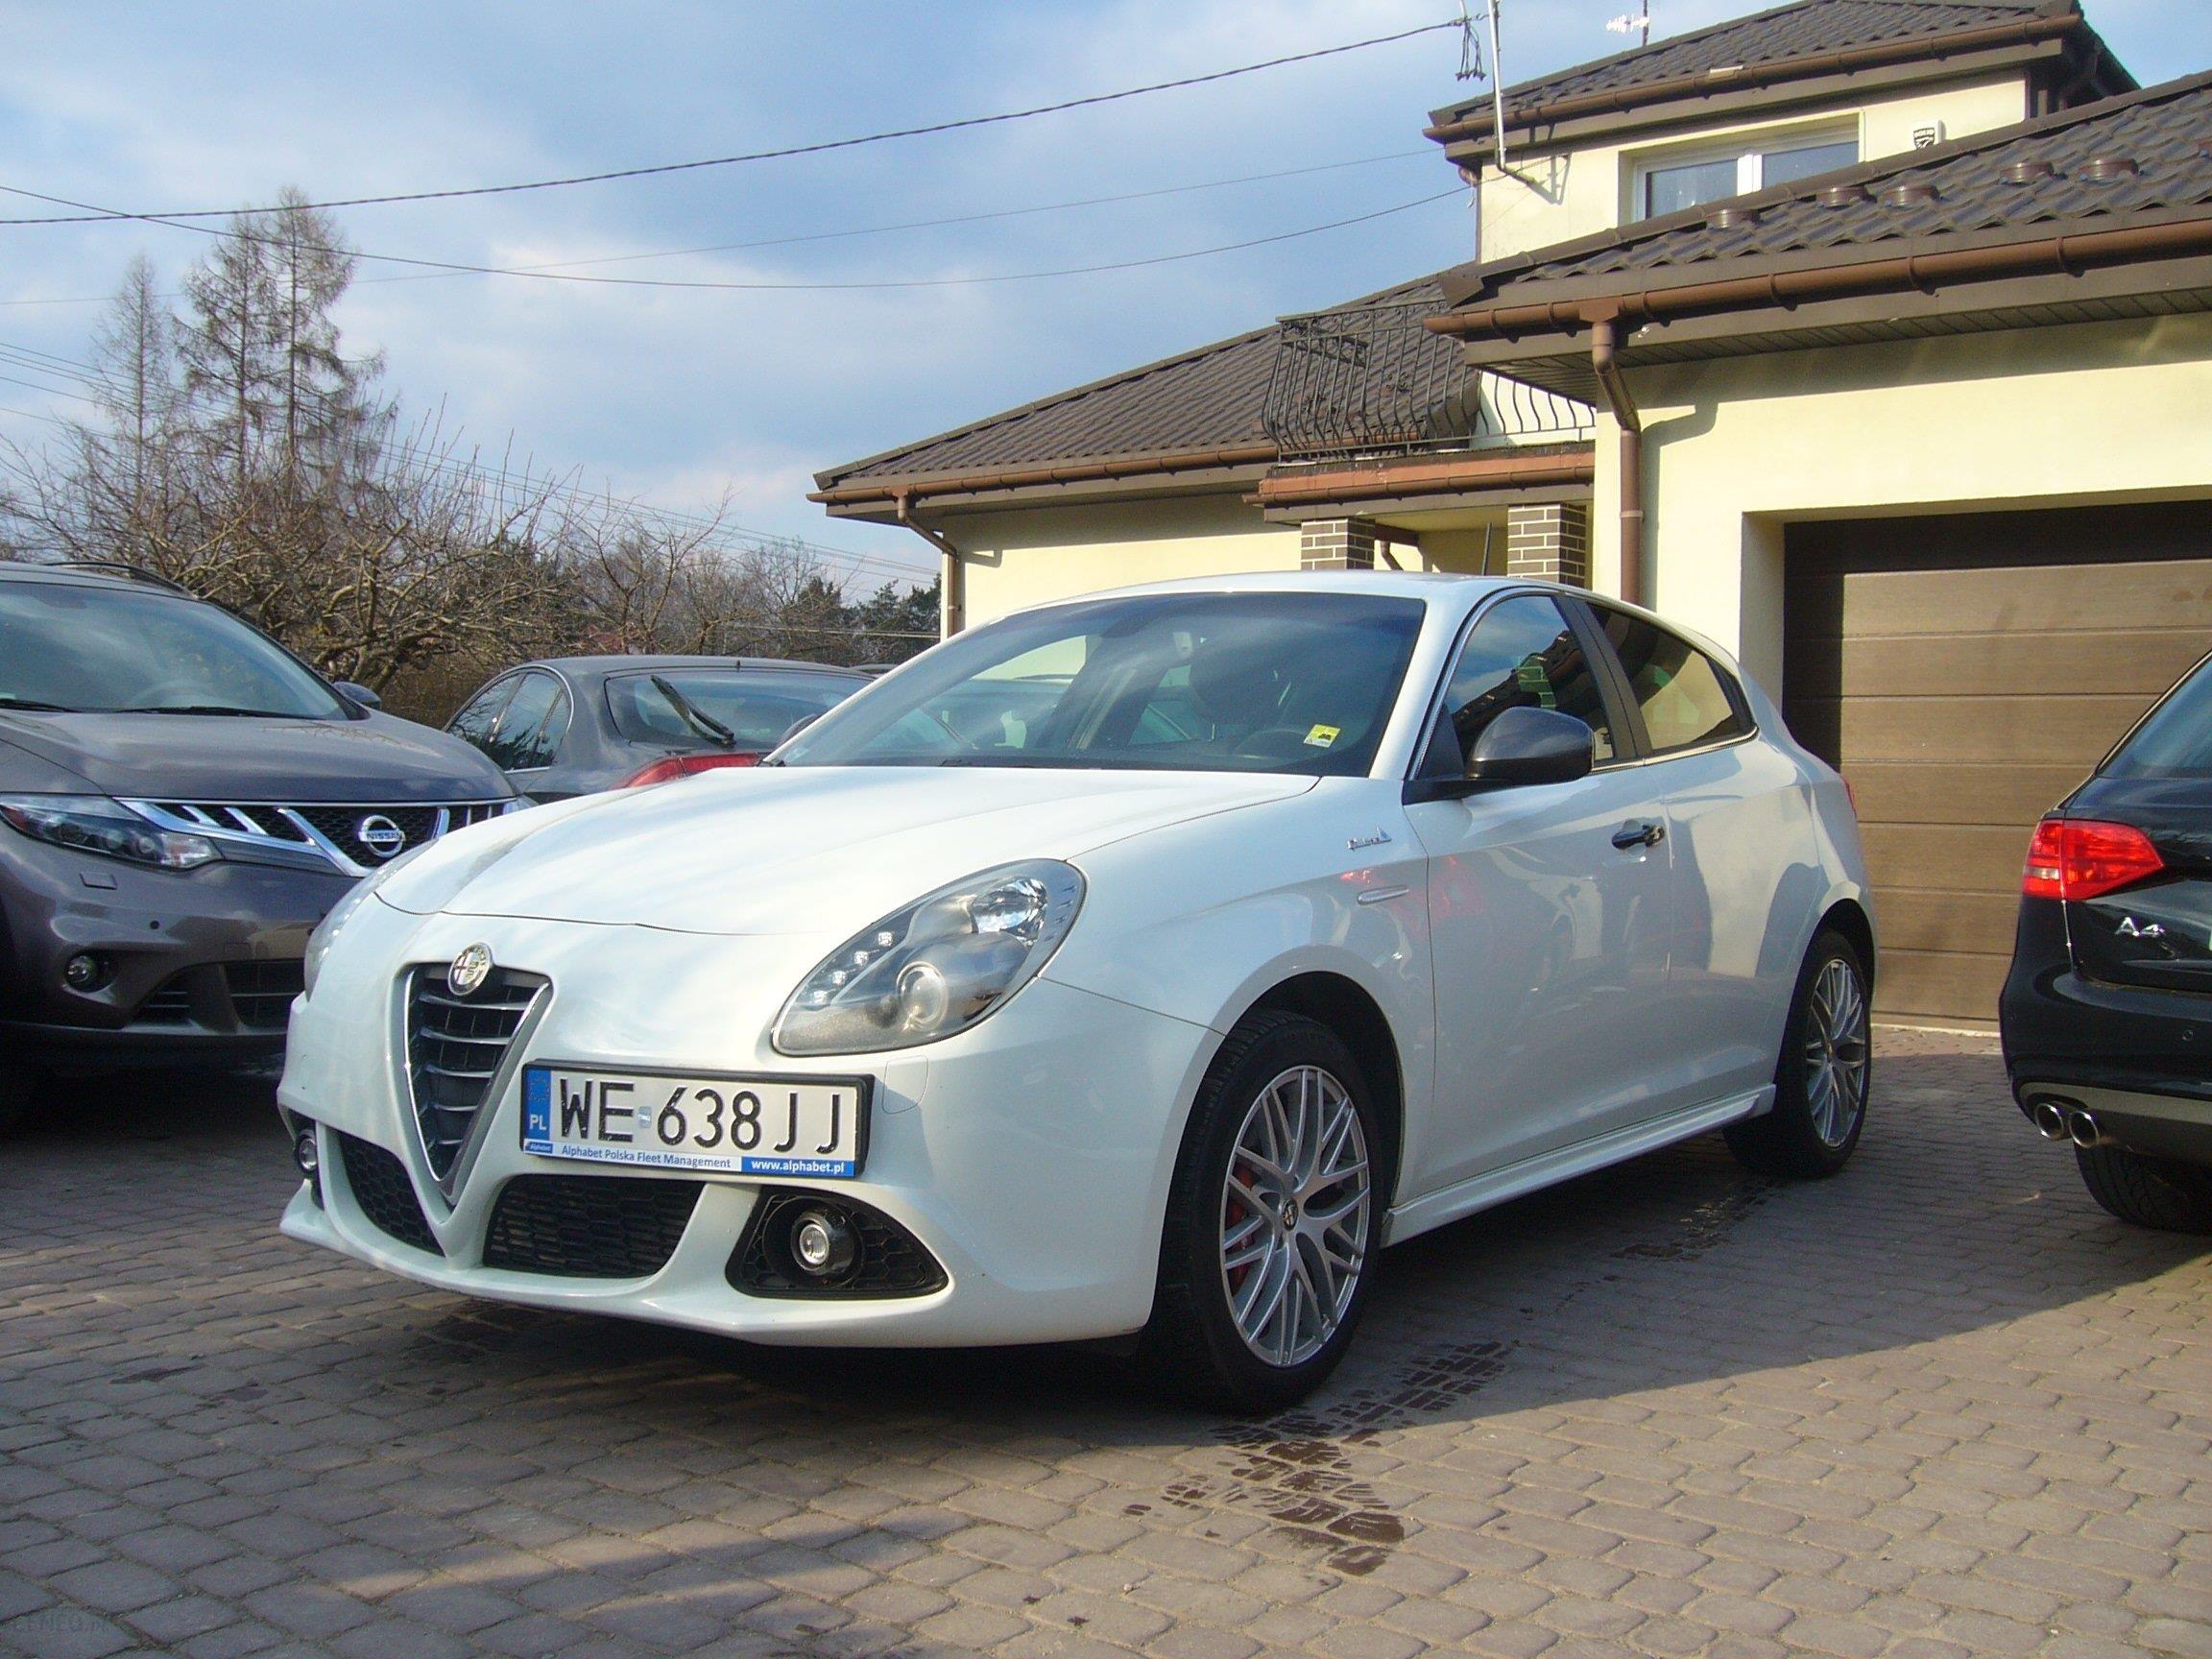 Alfa Romeo Giulietta 2014 sel 150KM hatchback biały Opinie i